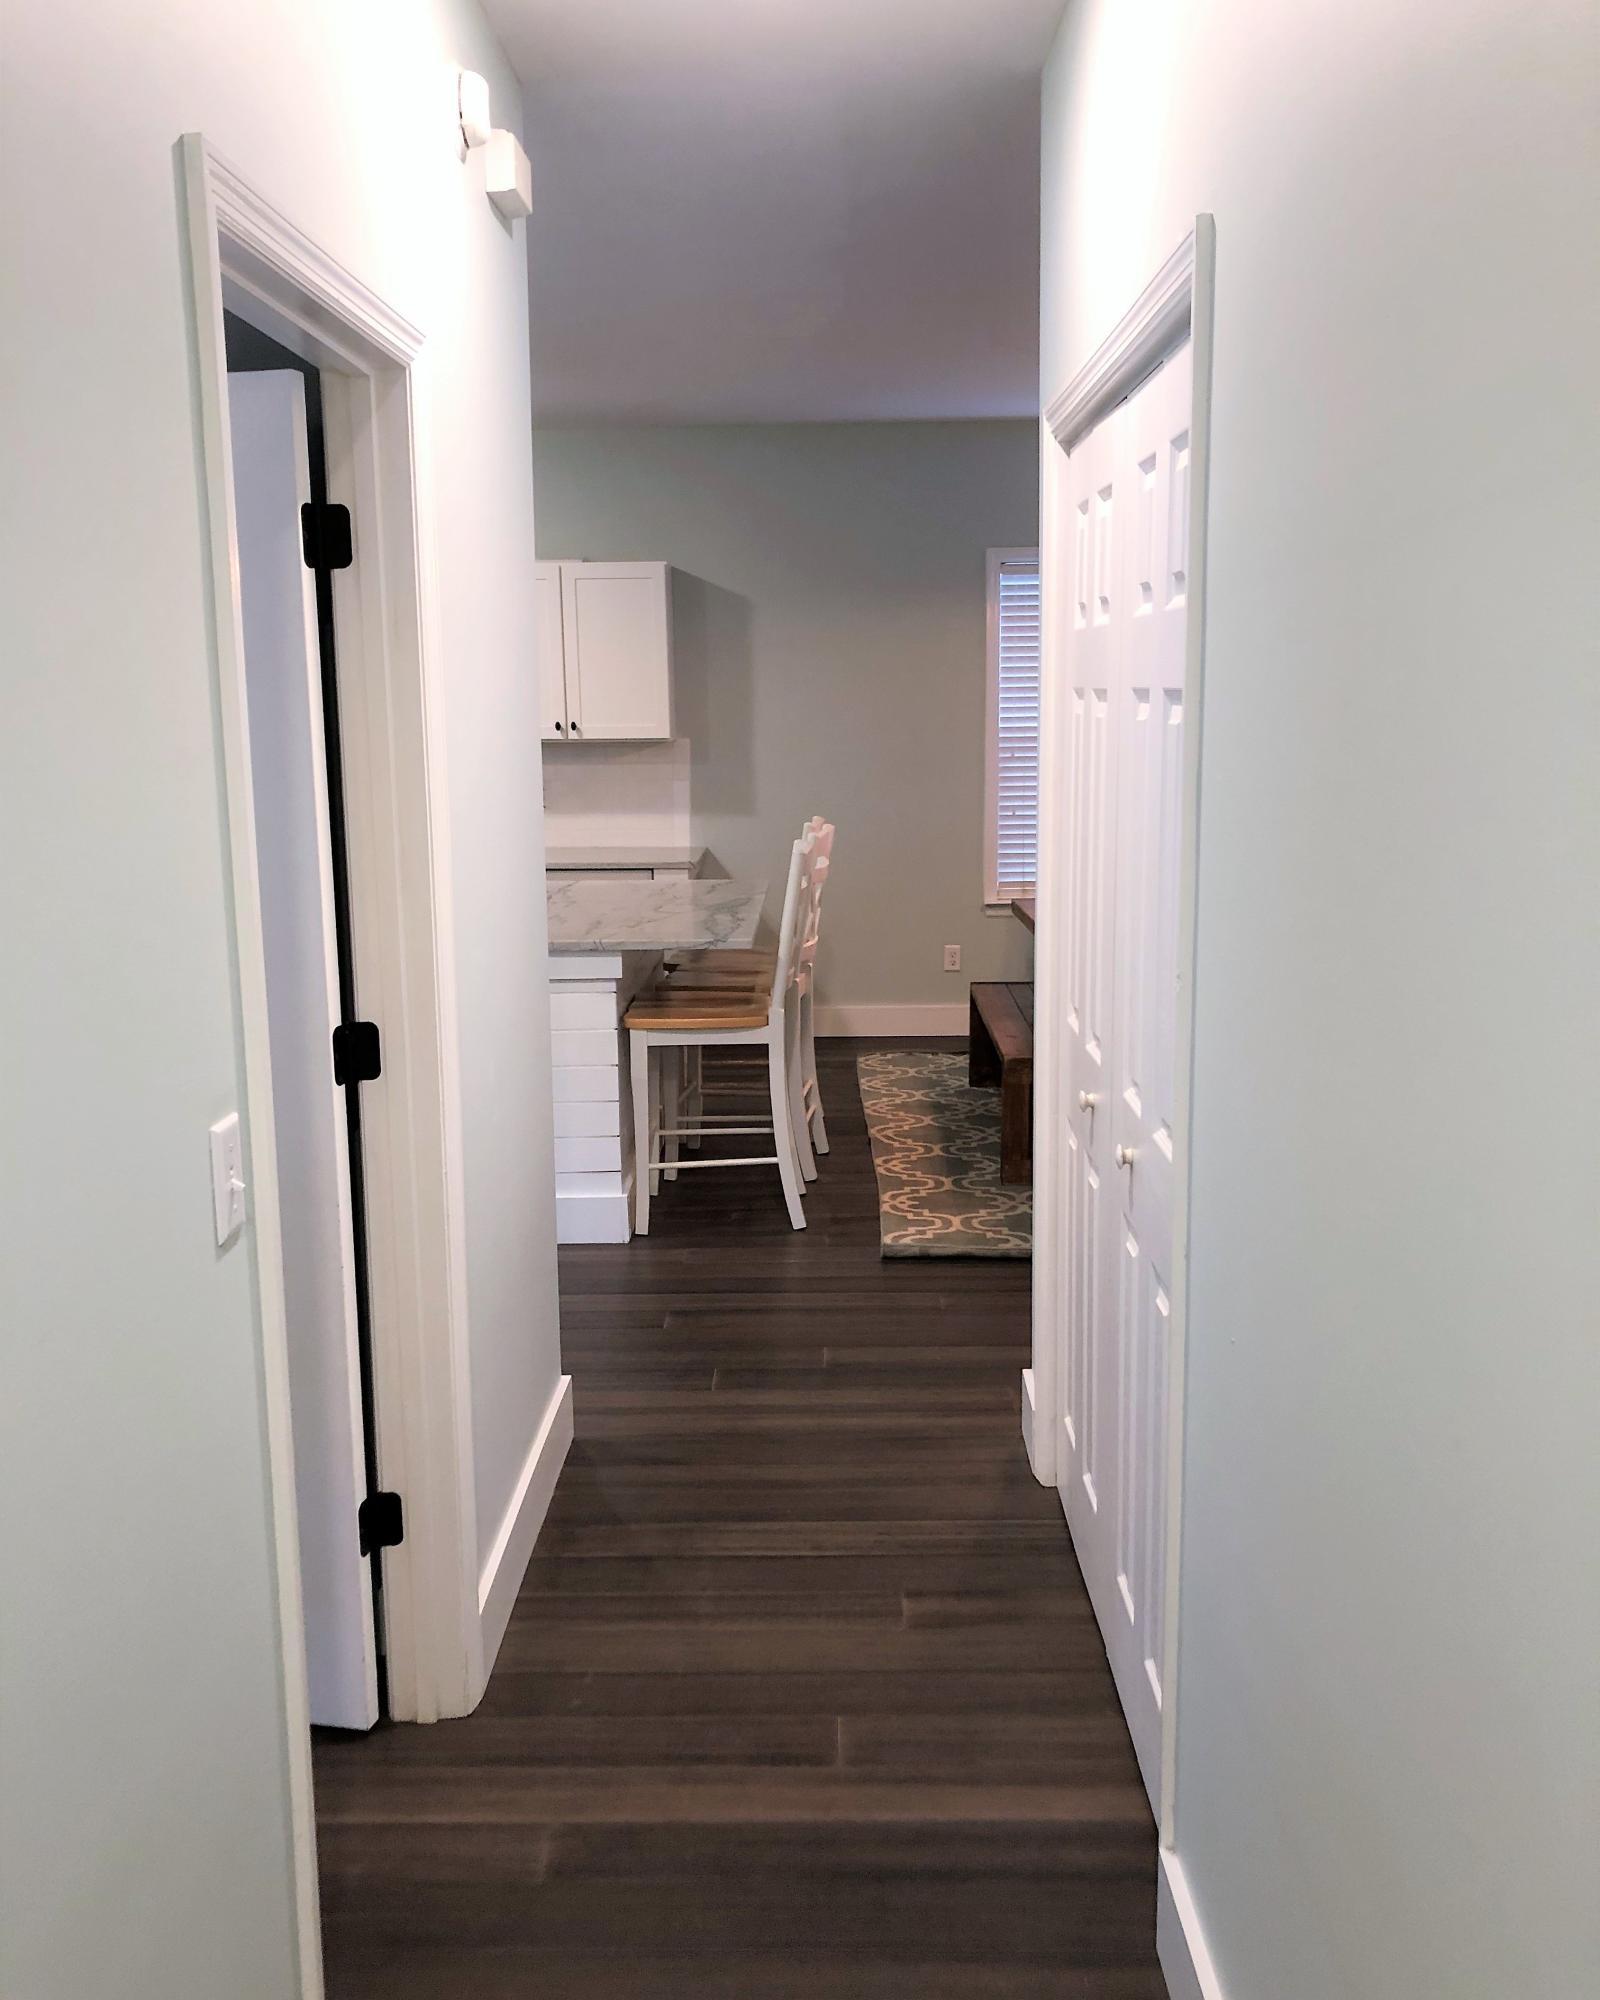 Fairway Villas Homes For Sale - 1542 Little Rock, Charleston, SC - 4